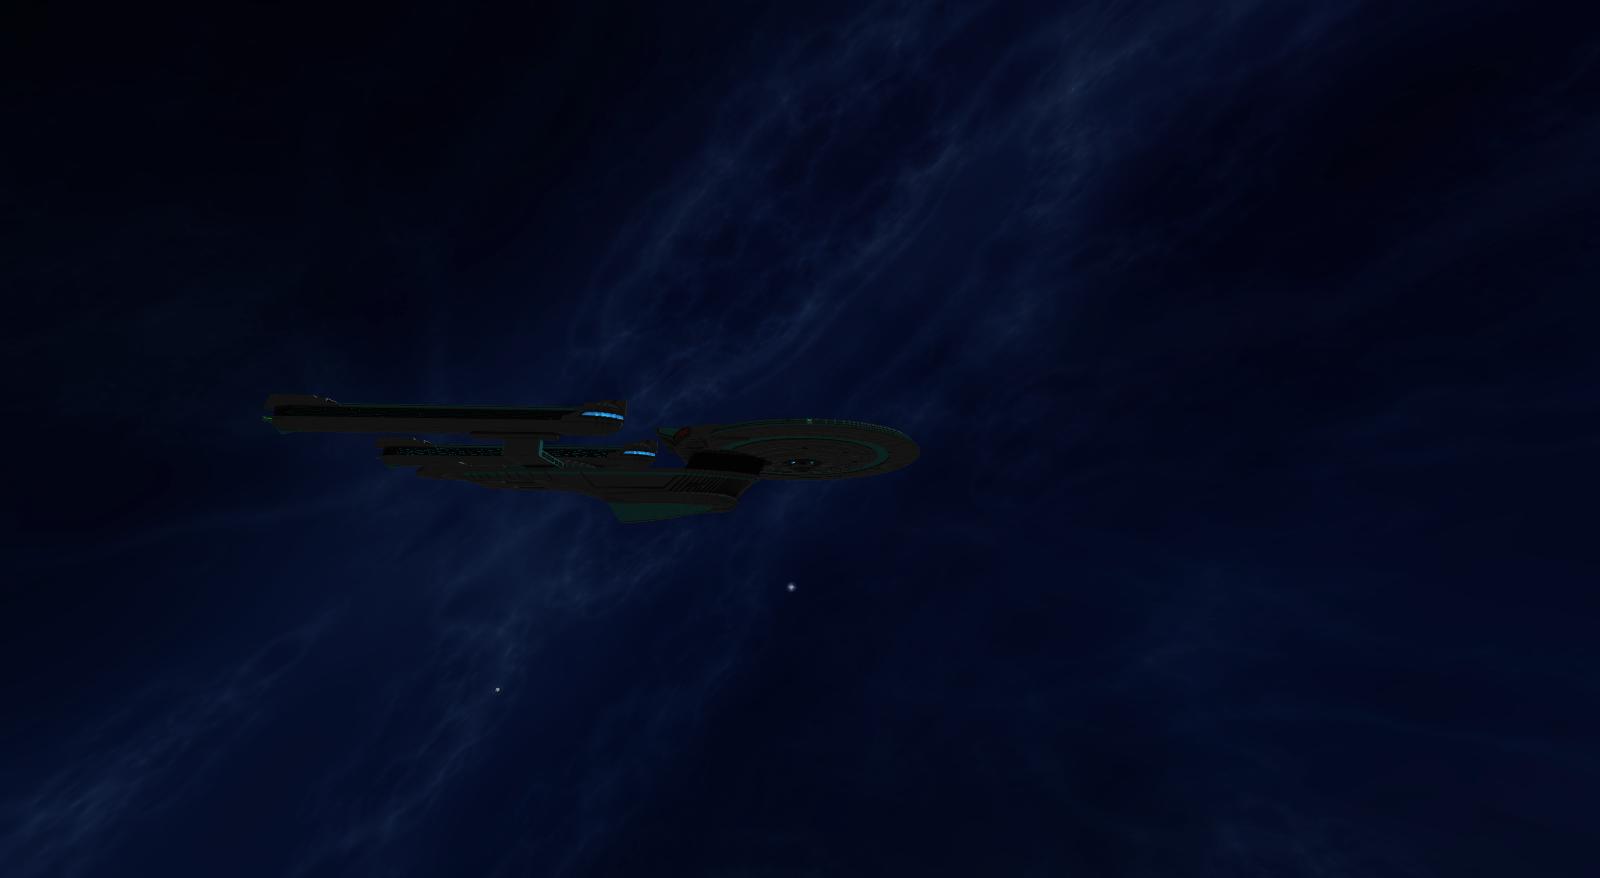 starmade-screenshot-0019.png